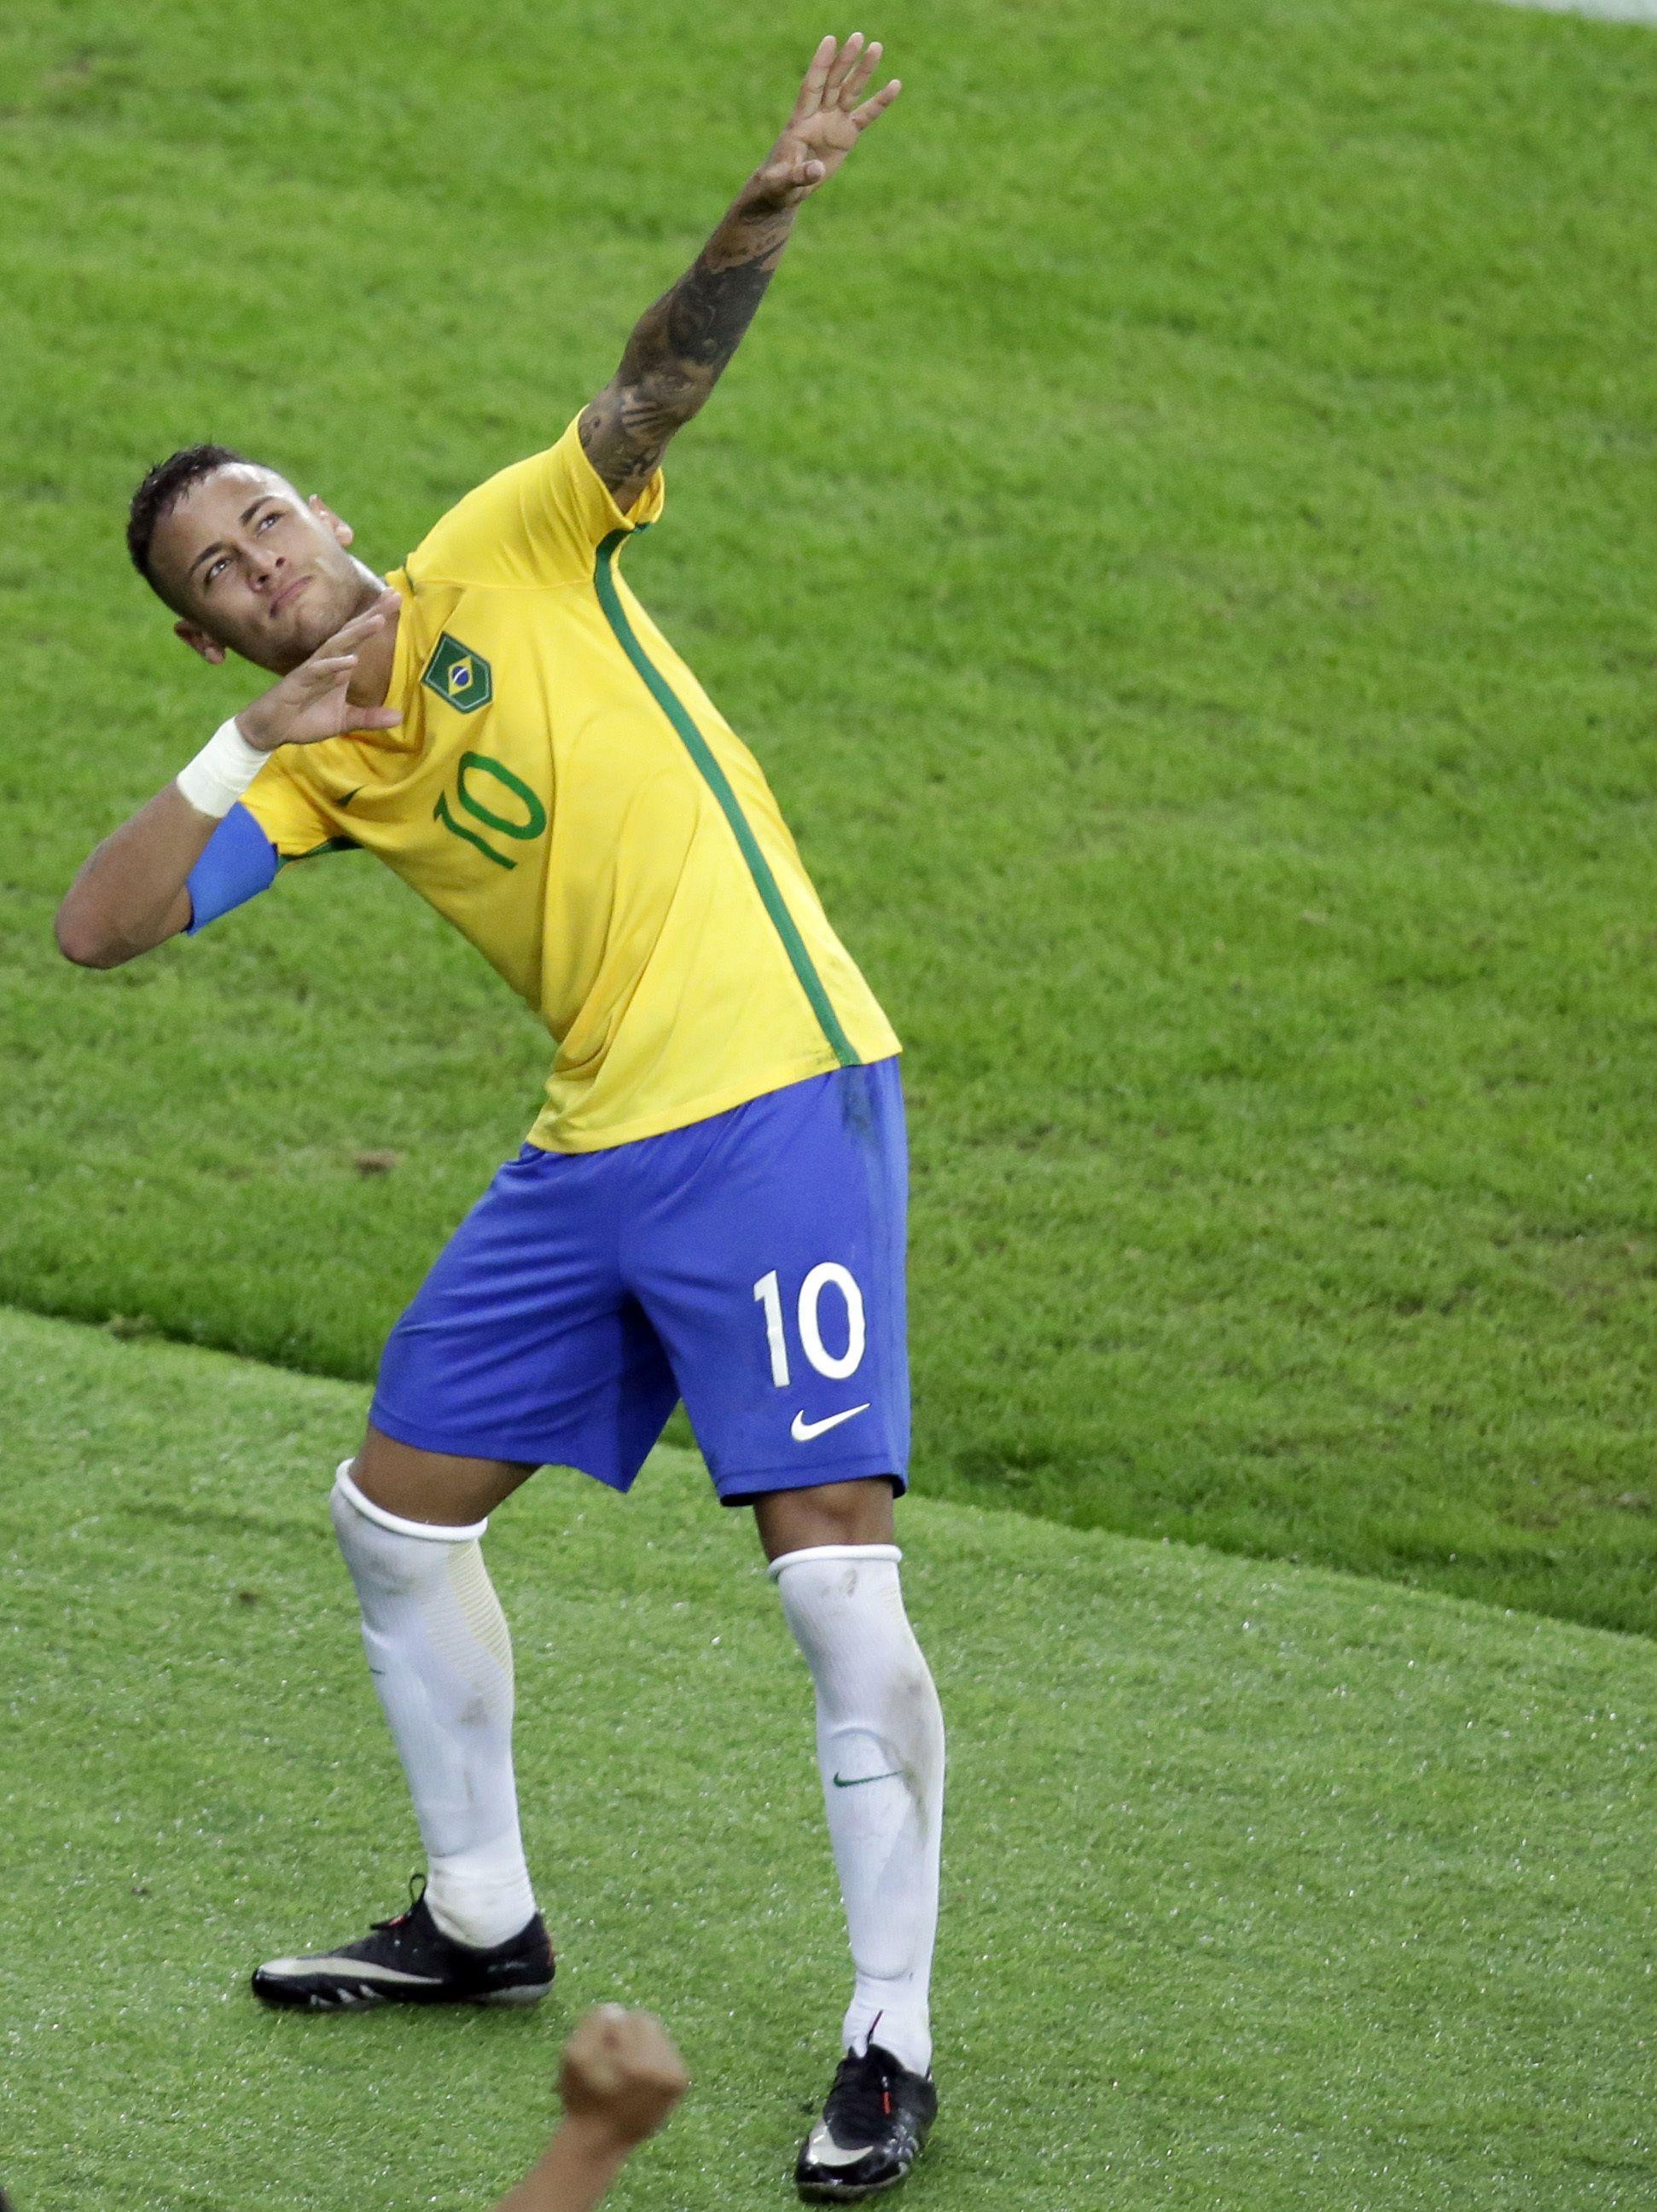 e0445d3c7 Pin by Rameensaeed on Neymar | Neymar, Usain bolt, Sports